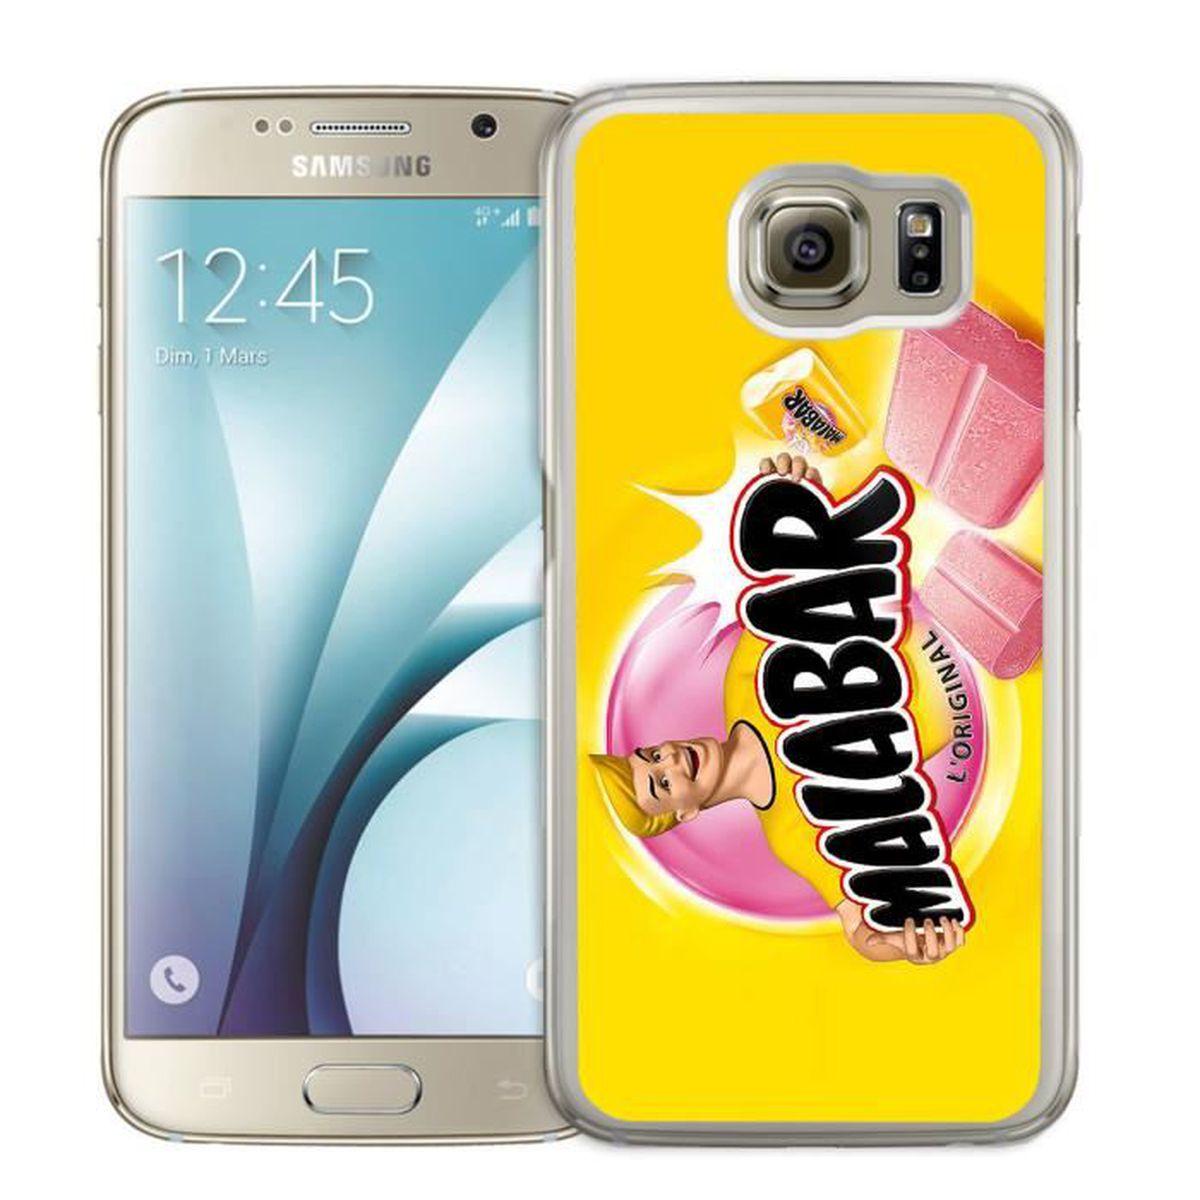 Coque Samsung Galaxy S5 : Malabar